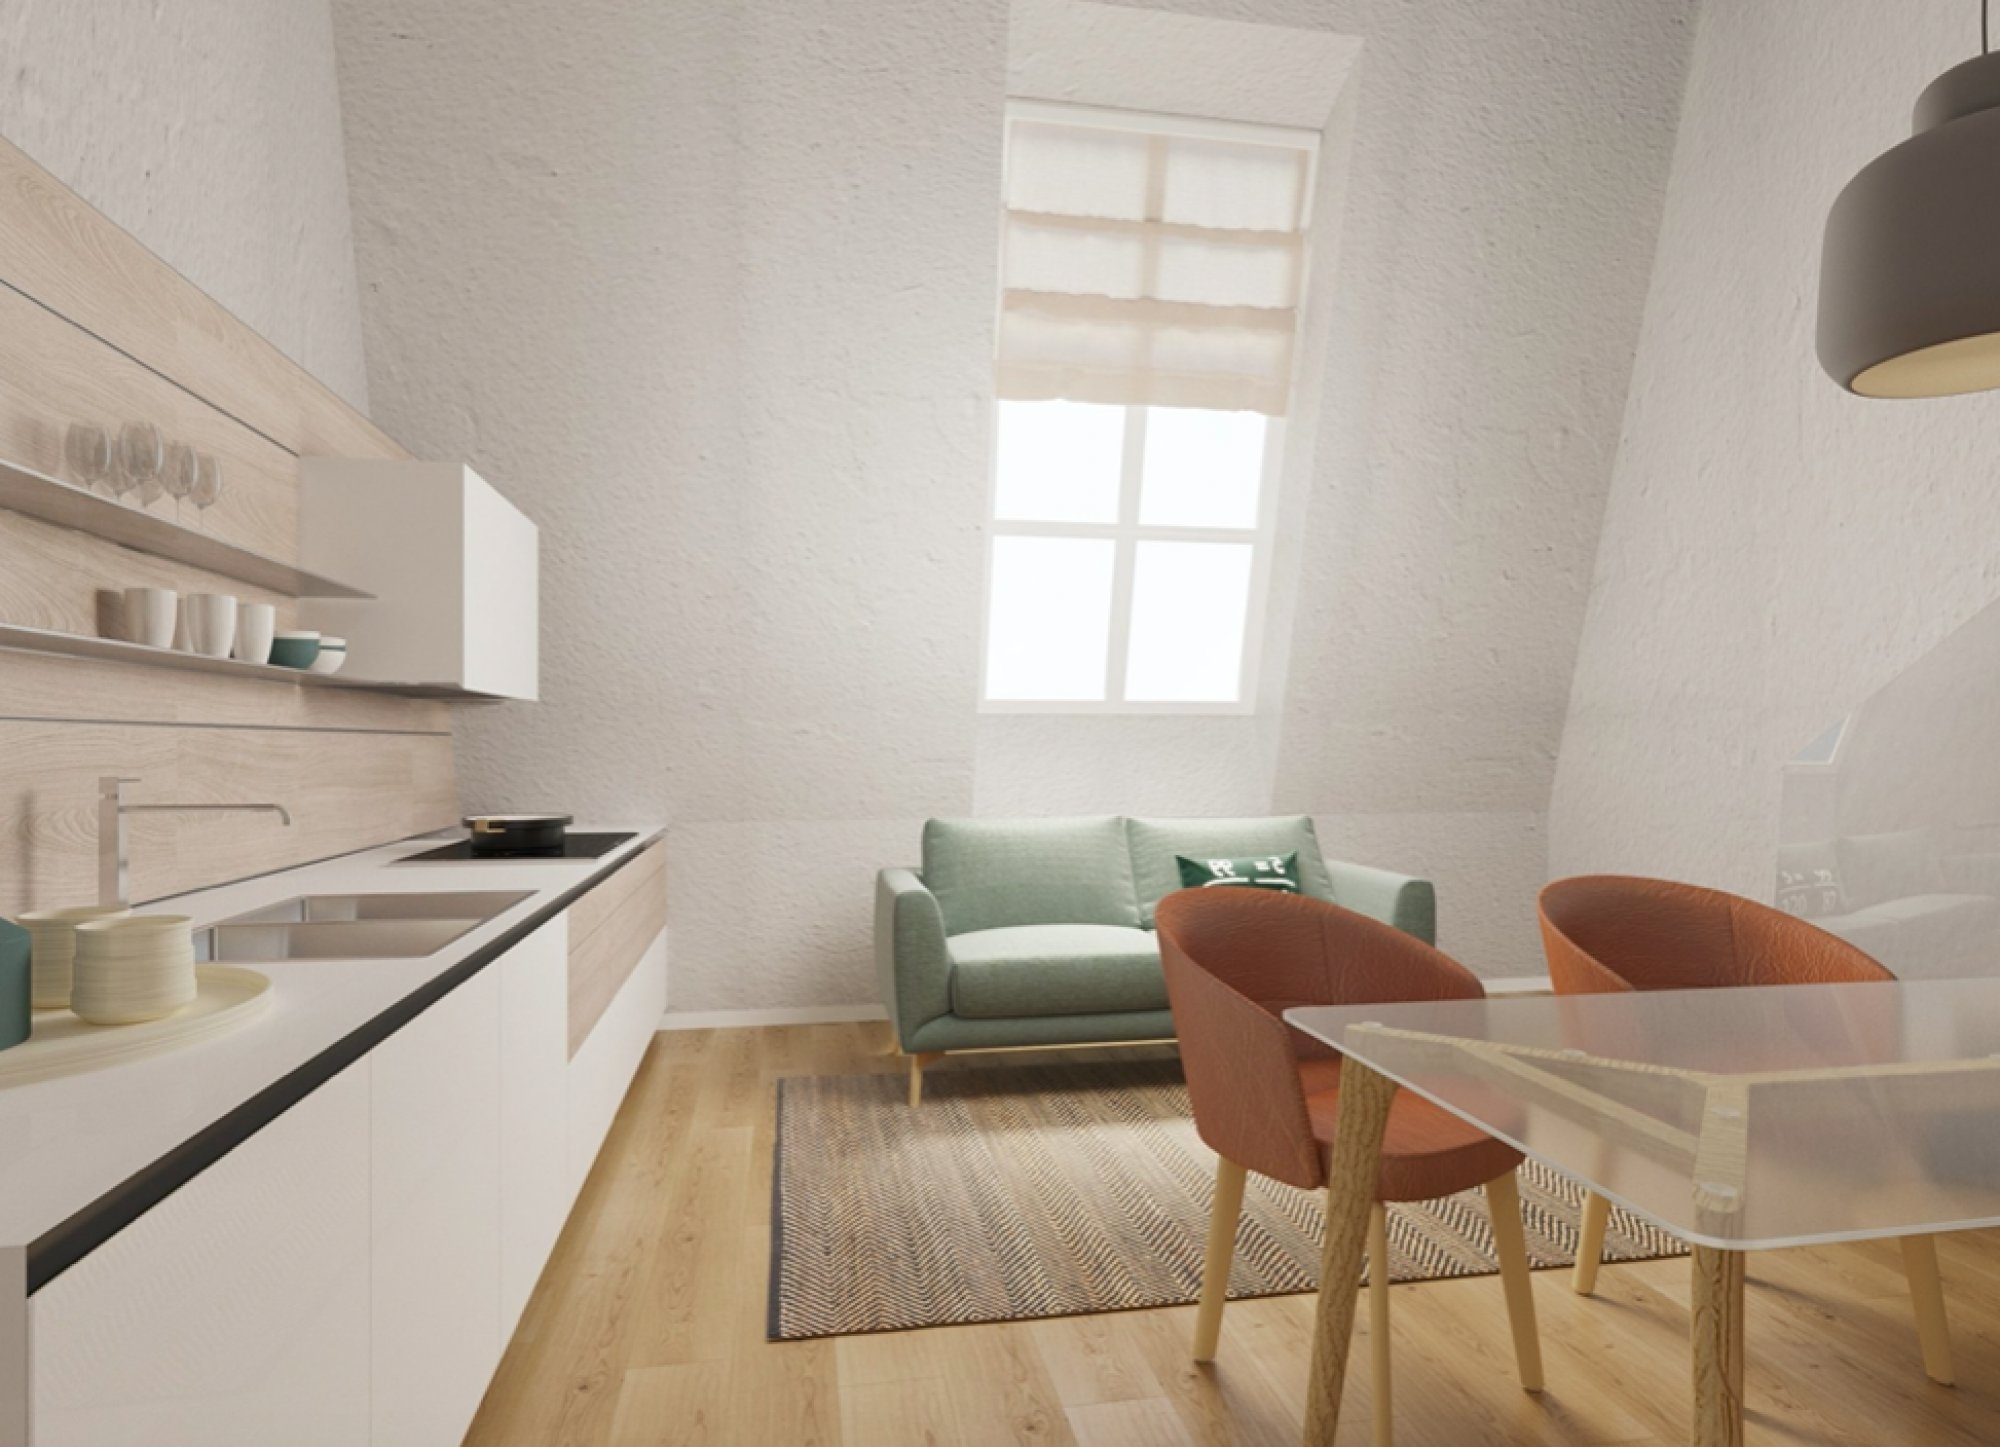 Půdní byt 3+kk, plocha 53 m², ulice Seifertova, Praha 3 - Žižkov | 2